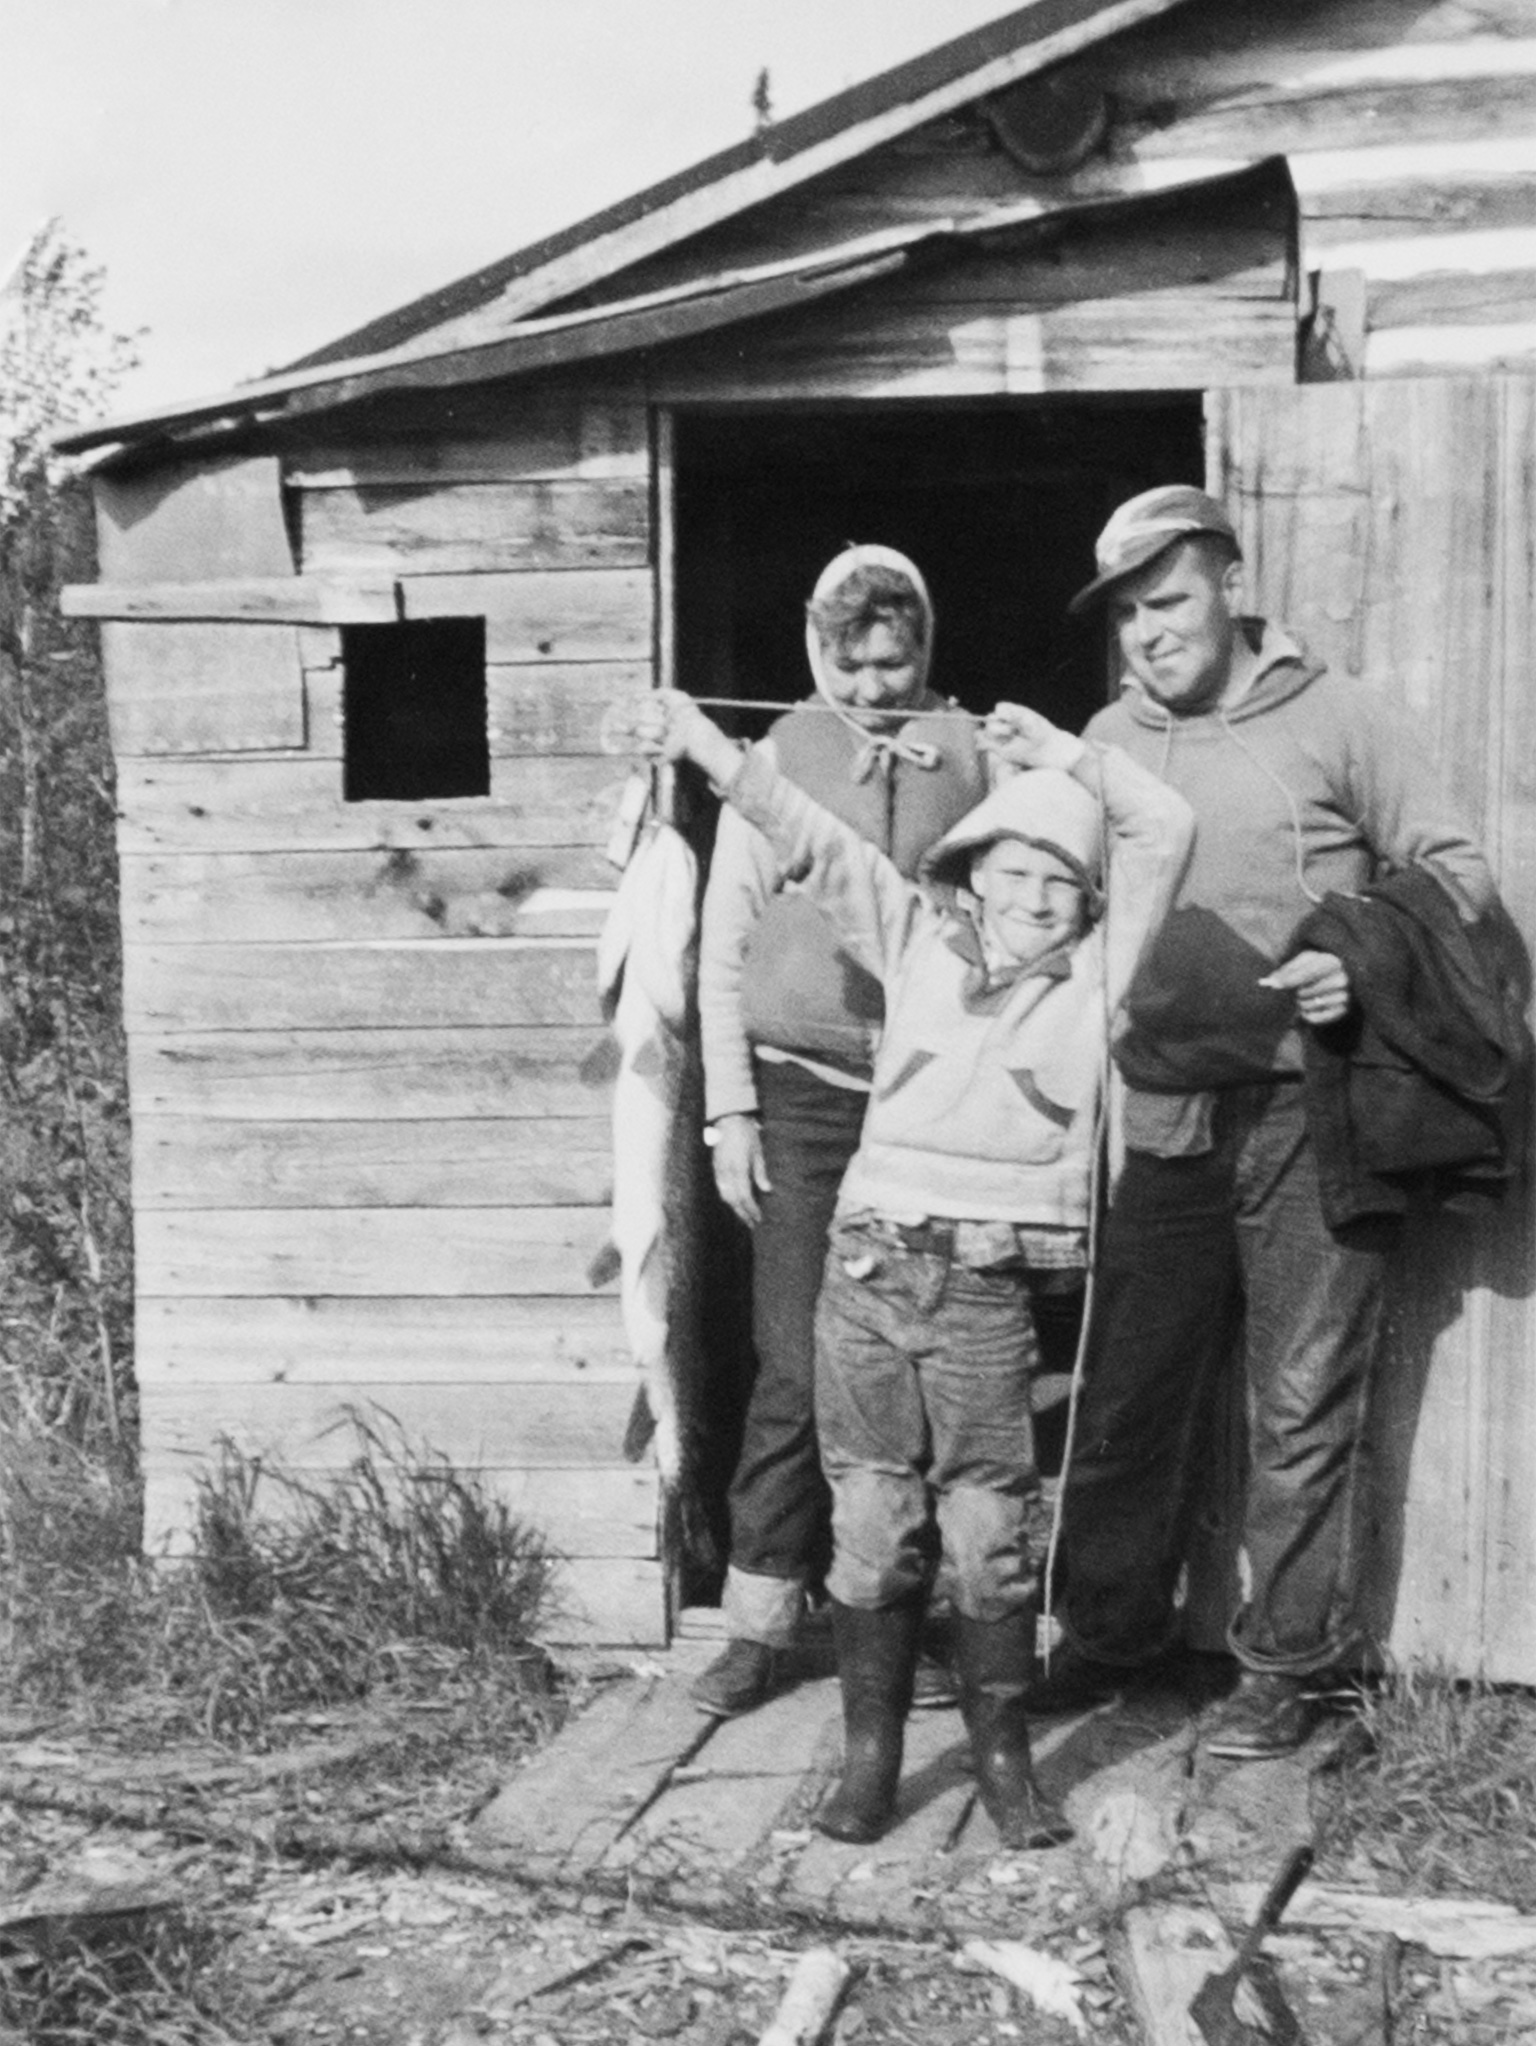 Dan Gable and his parents, 1958